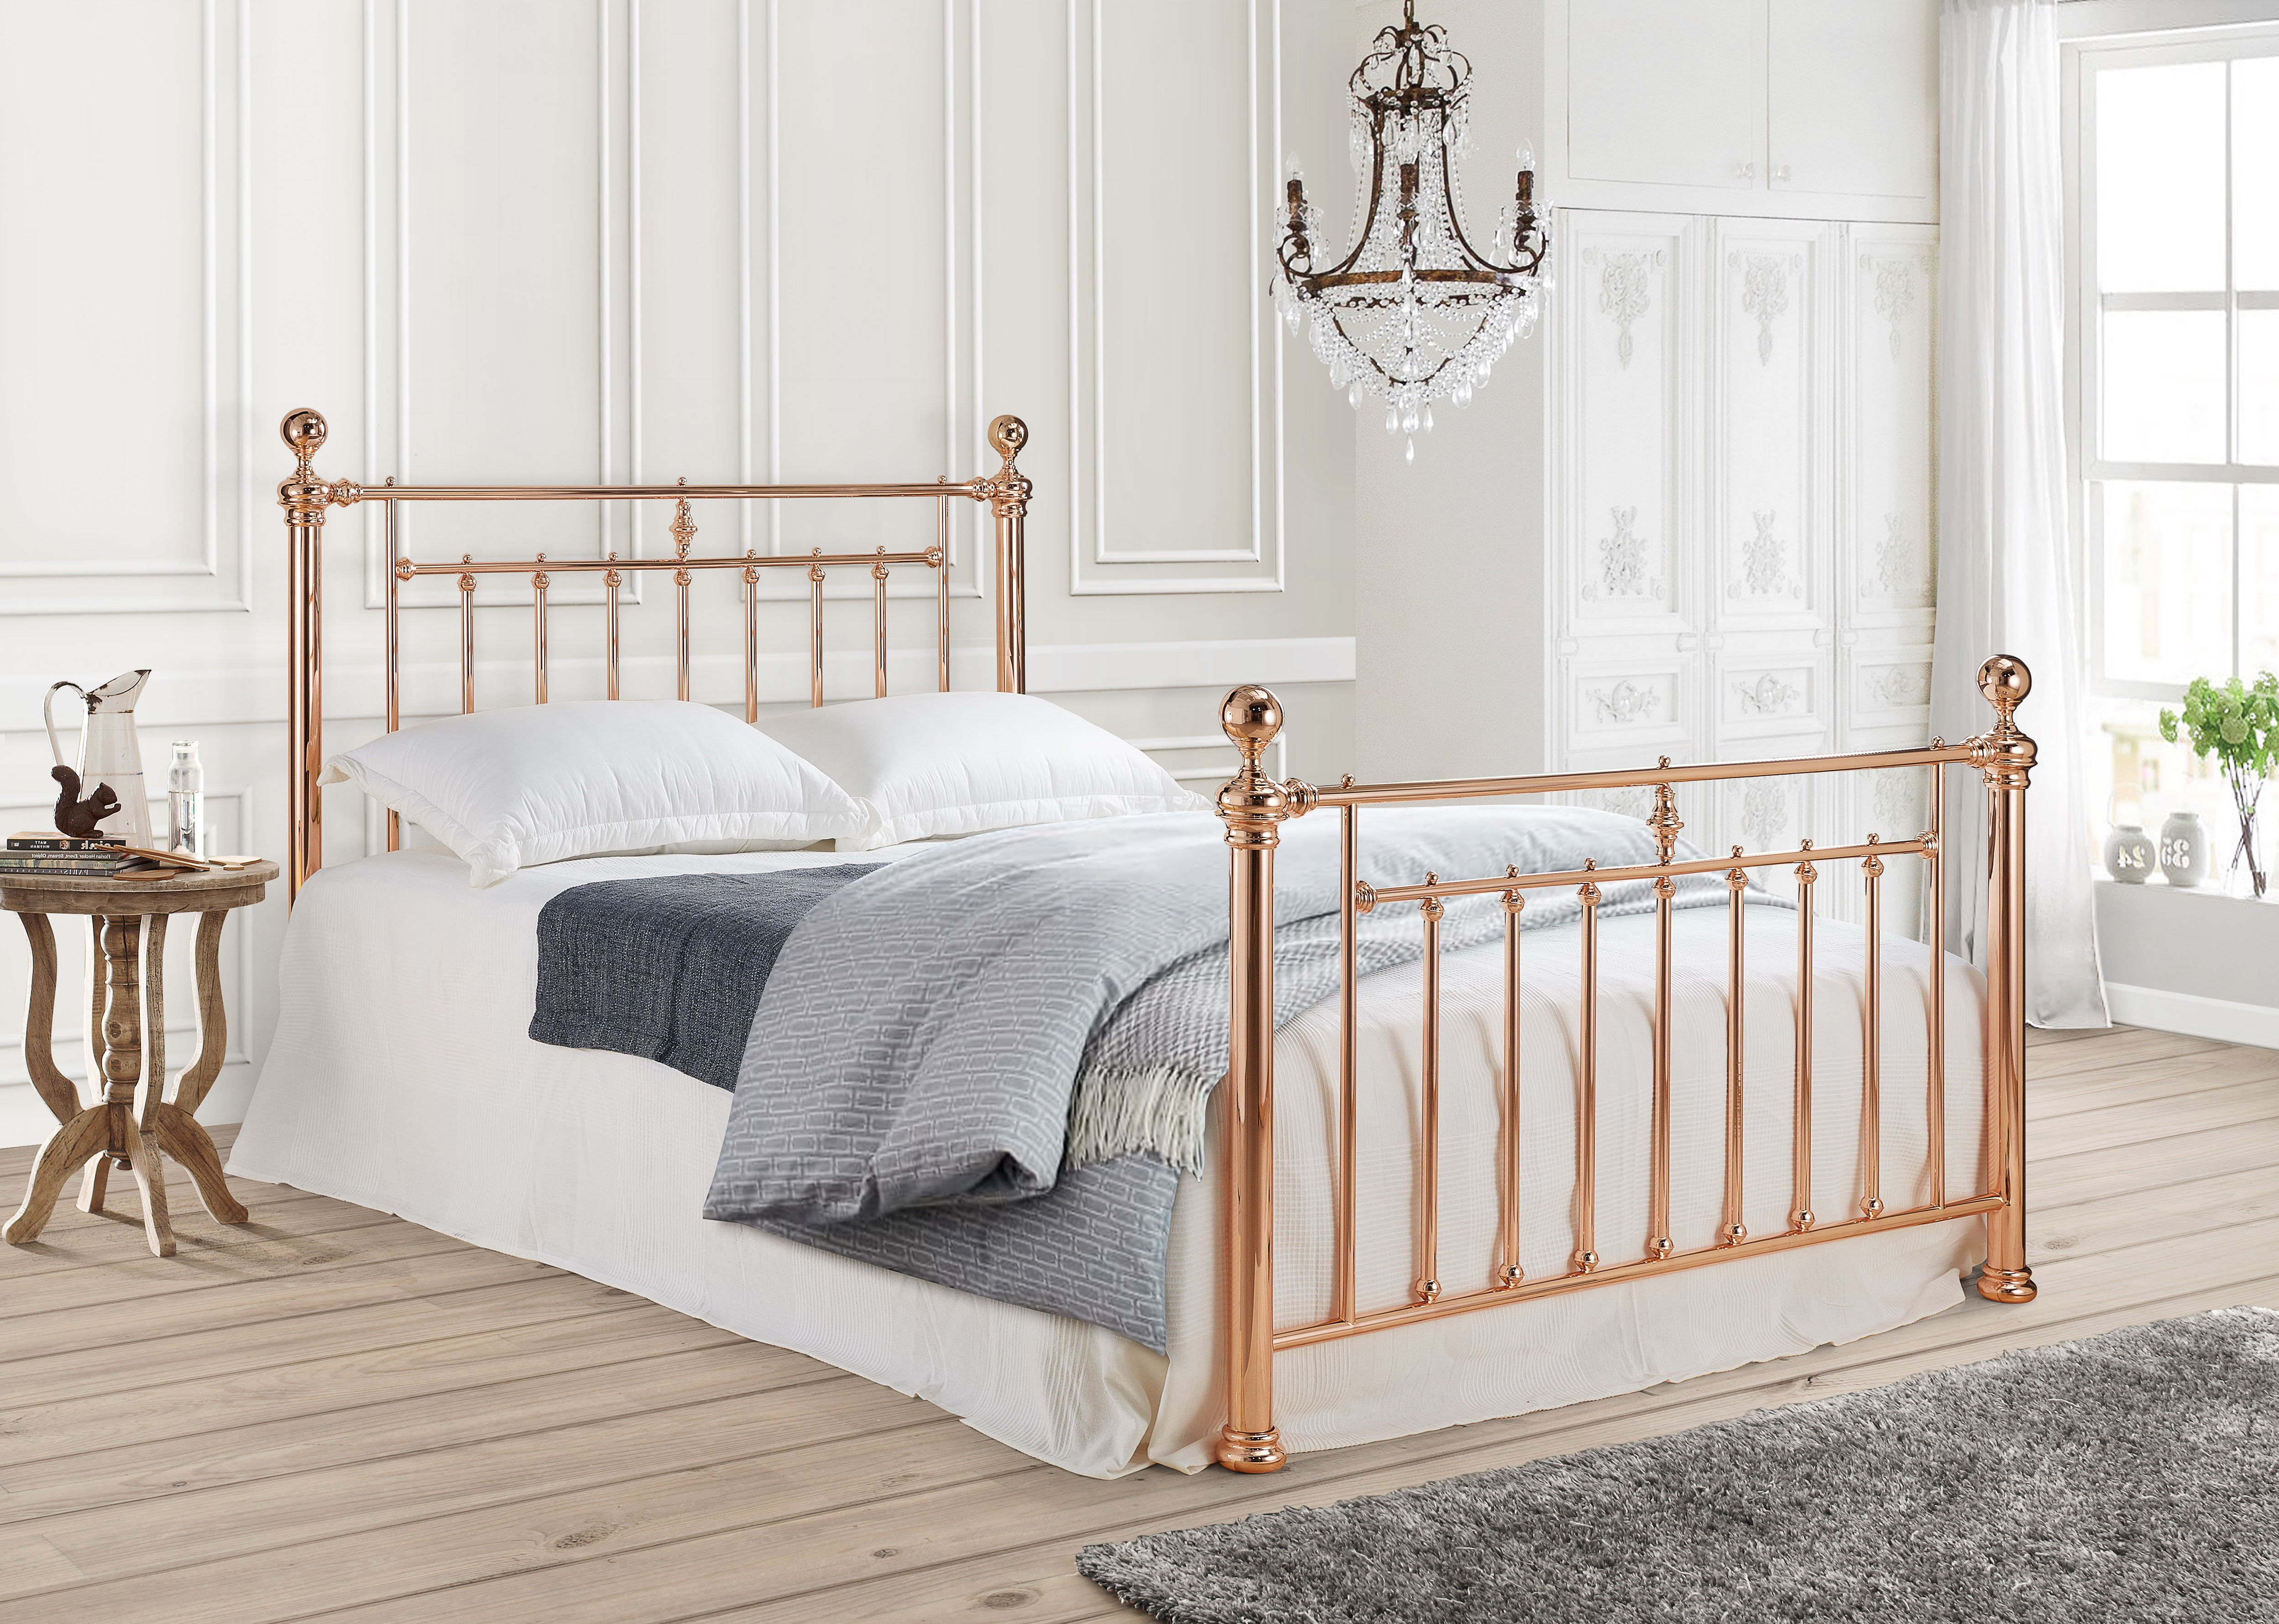 Beds Amp Mattresses By Northern Carpets Amp Beds Ltd